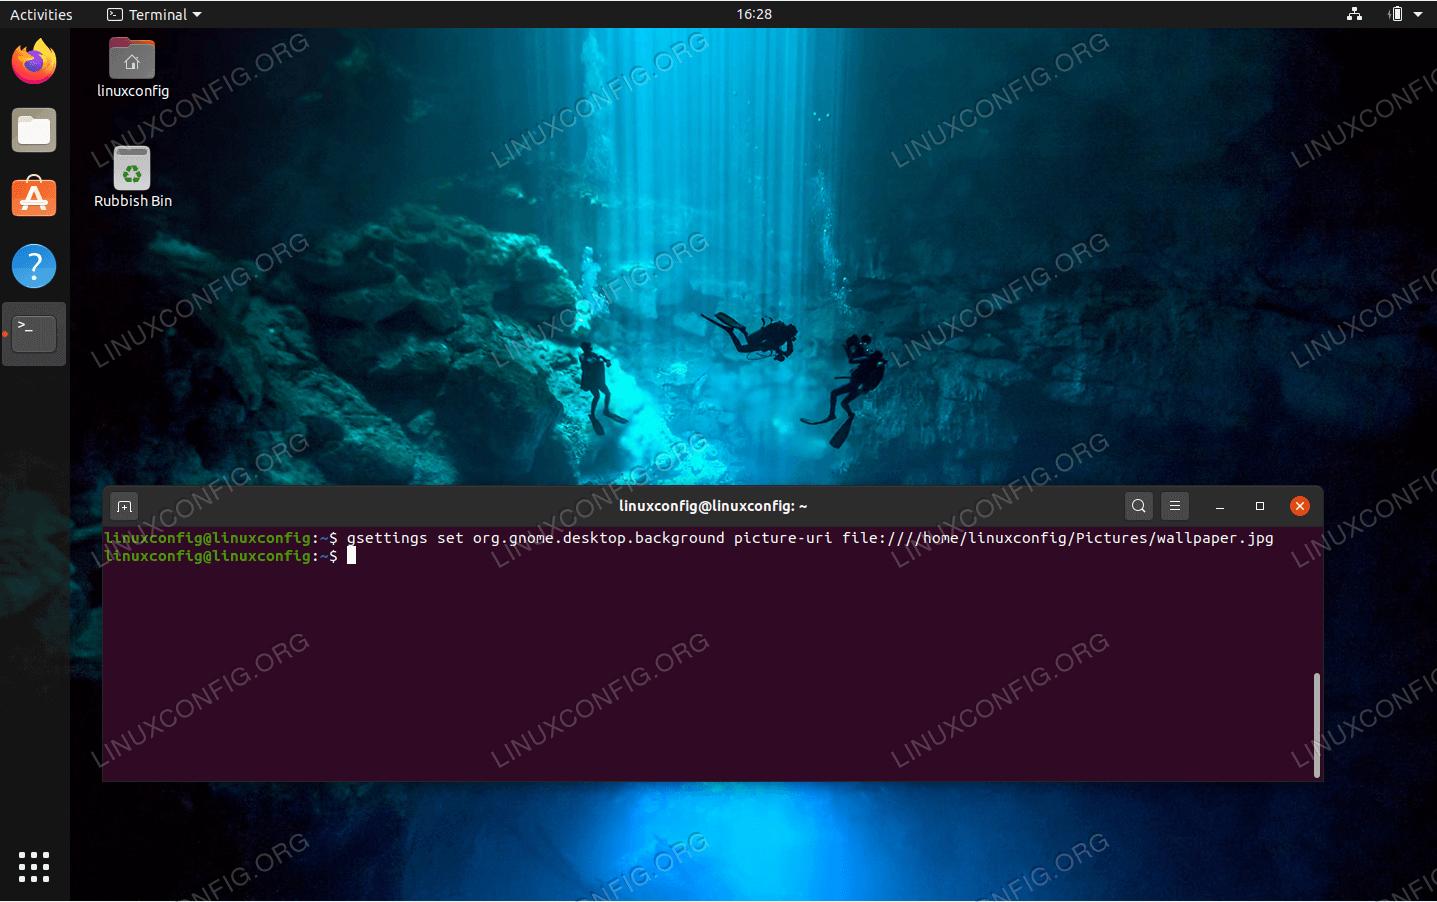 Set Wallpaper On Ubuntu 20 04 Using Command Line Linuxconfig Org